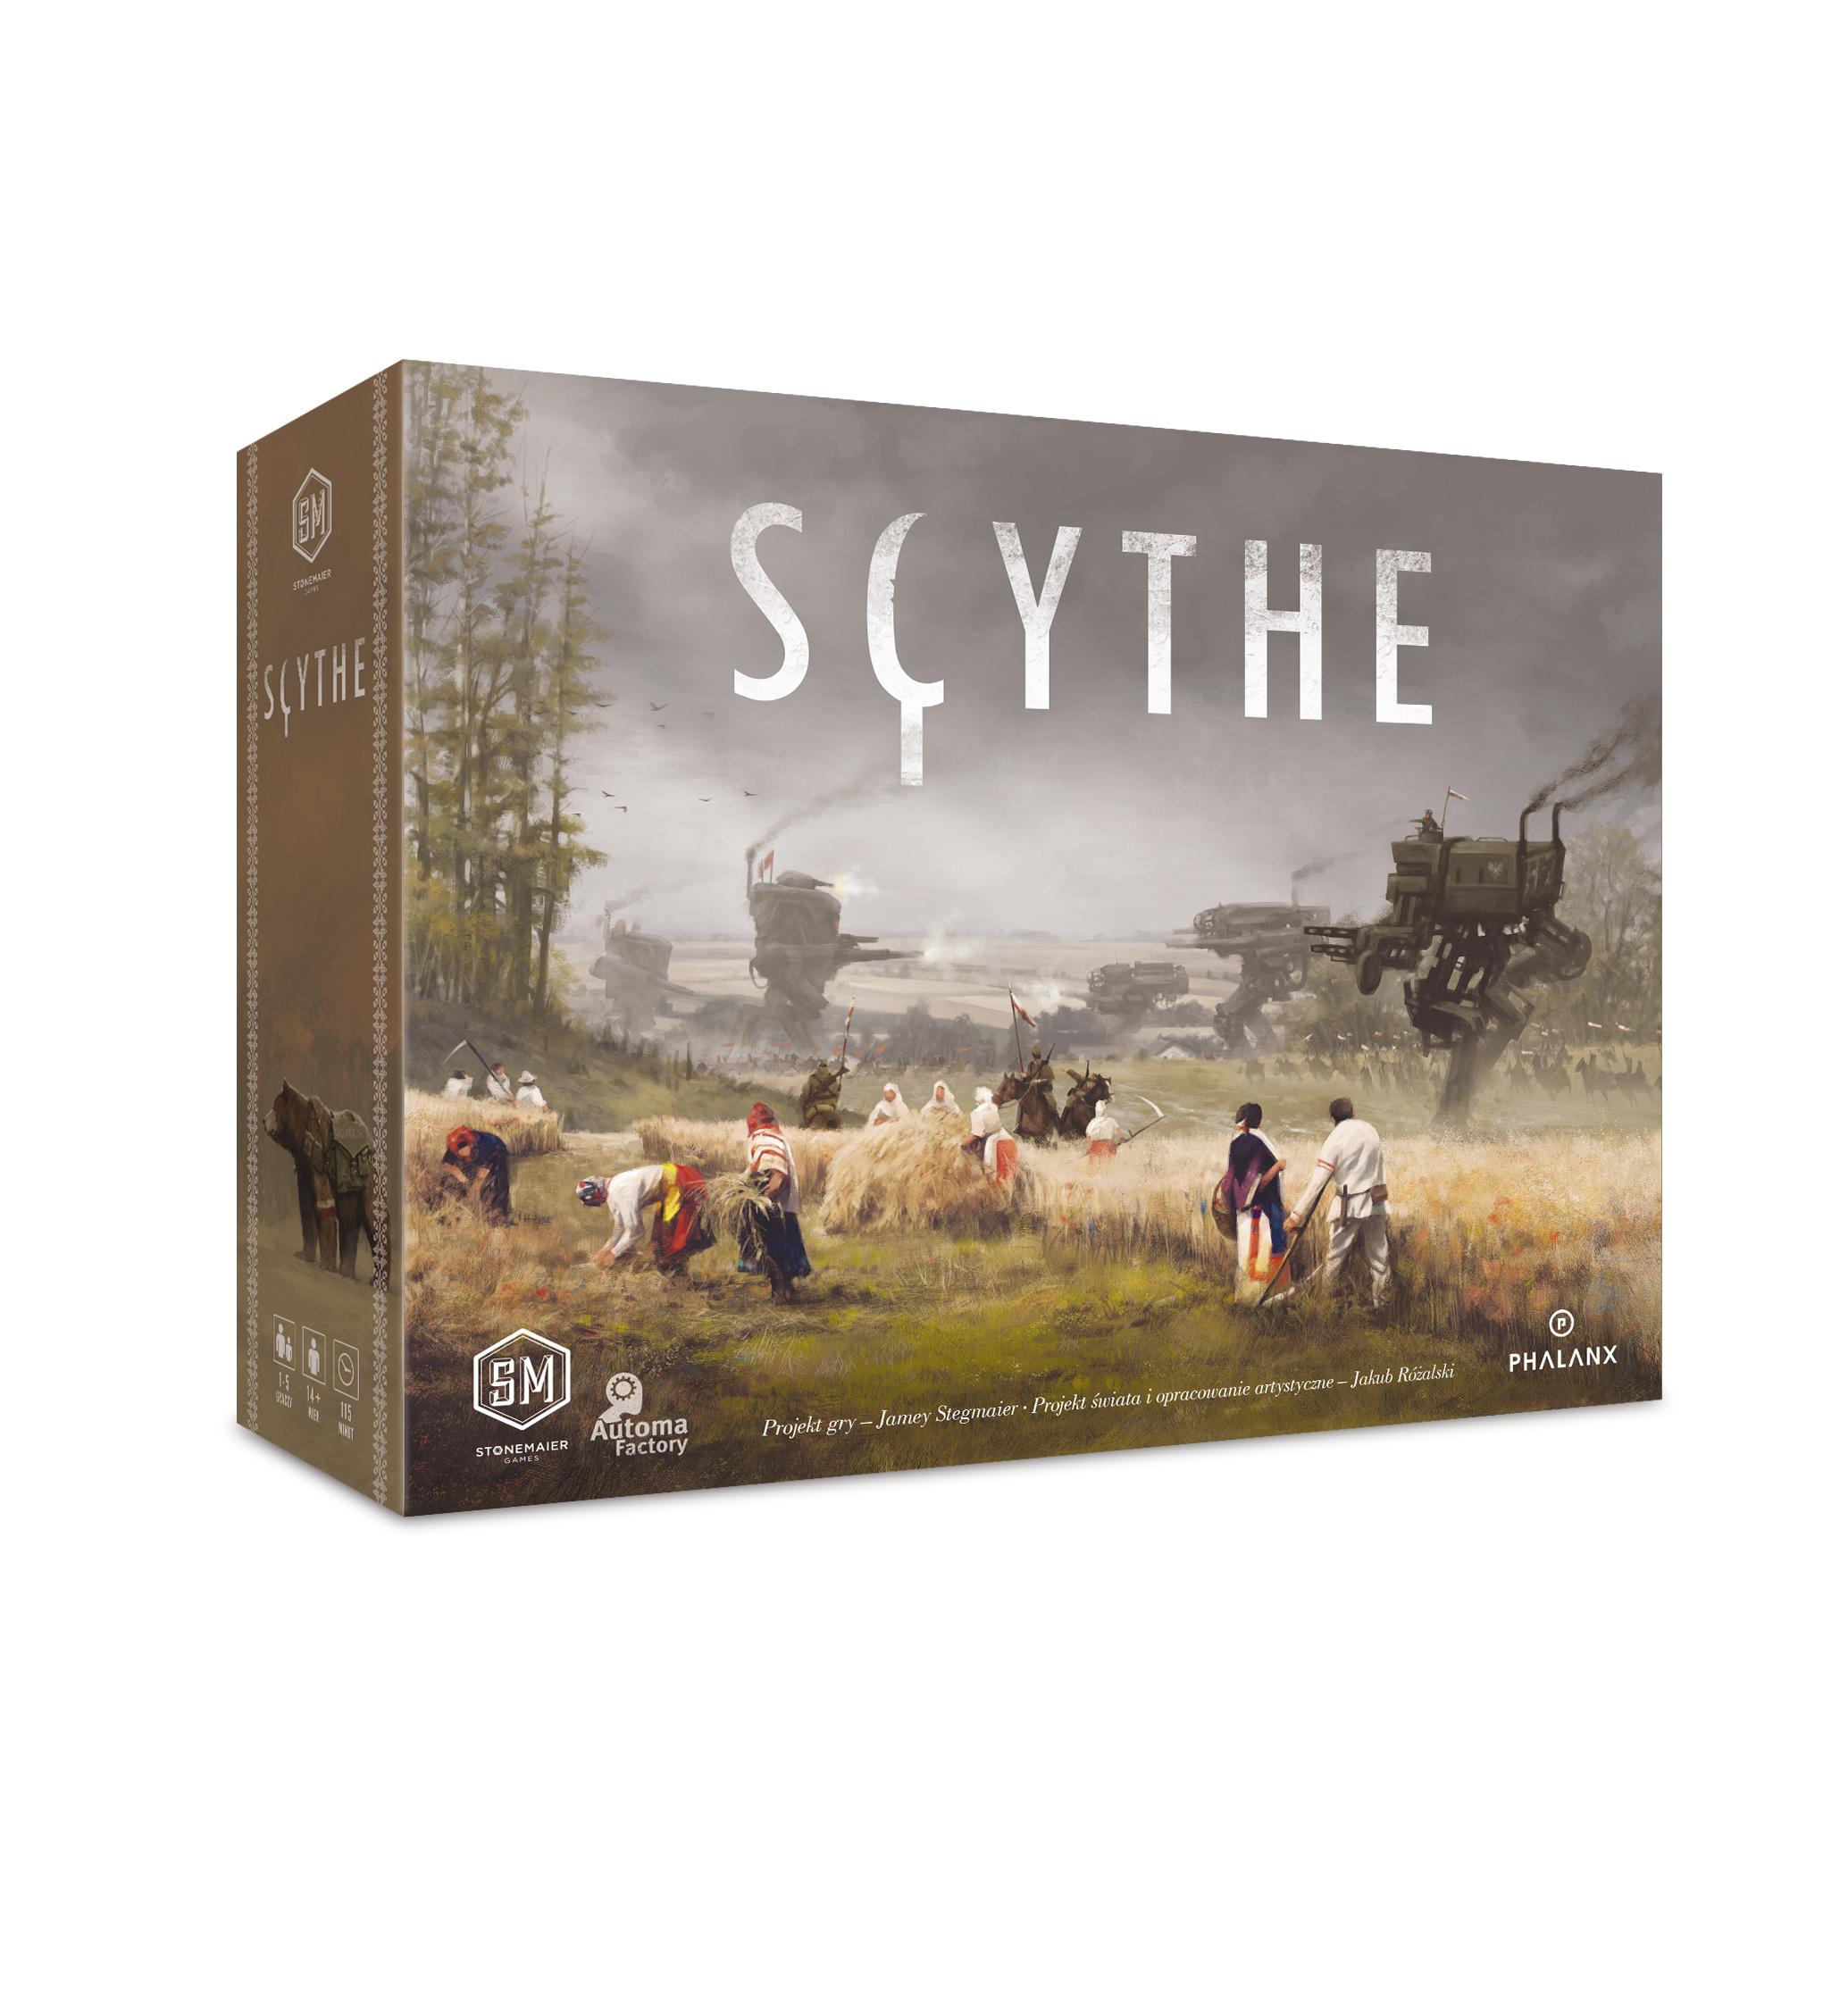 scythe PL (1)